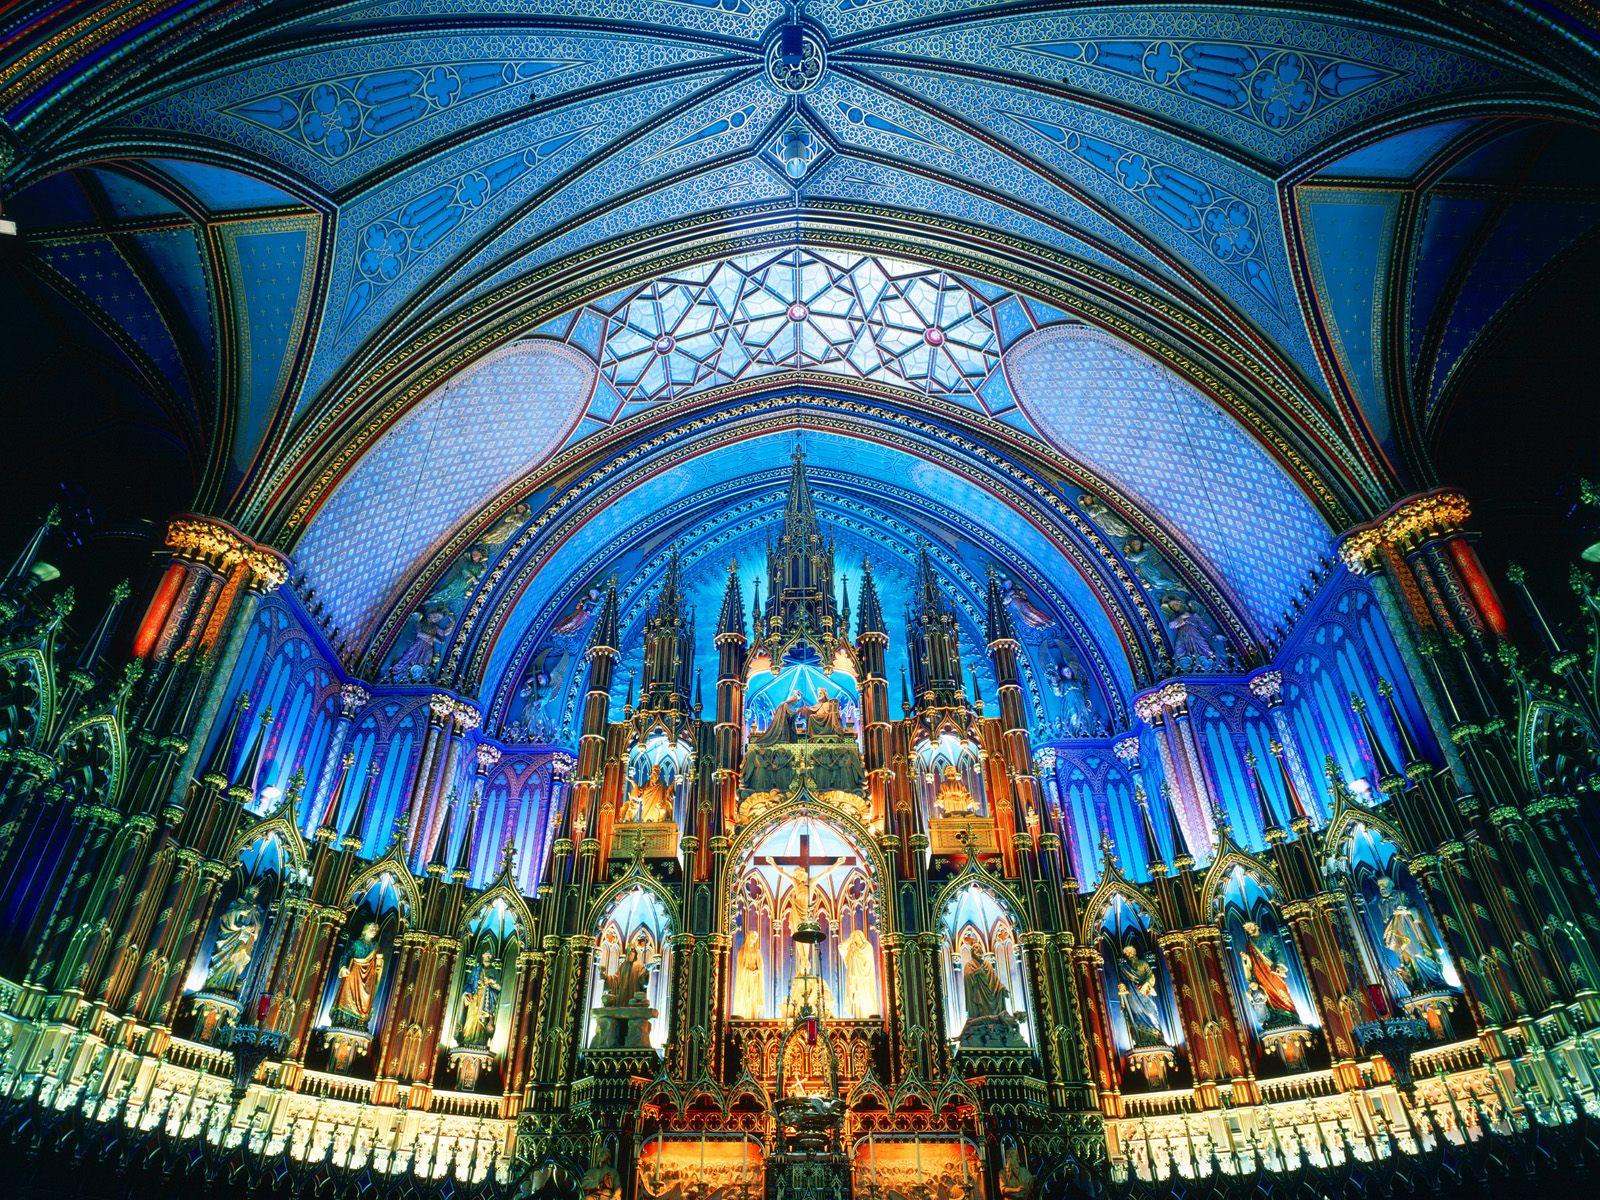 Notre DameBascilica